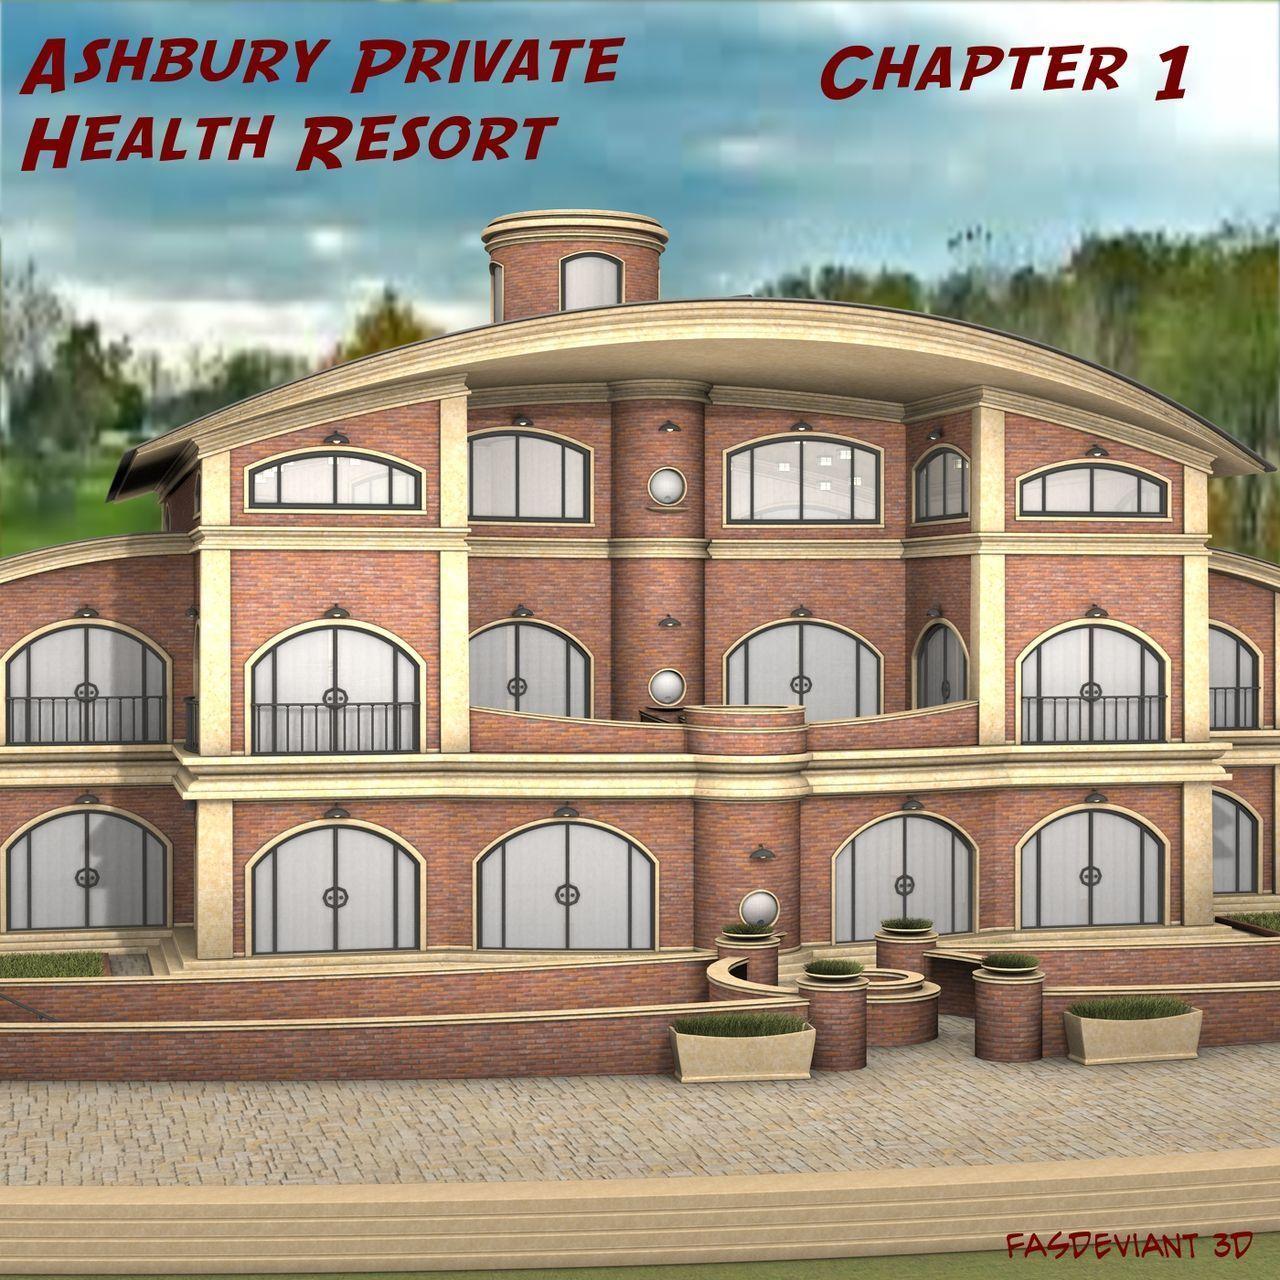 [Fasdeviant] Ashbury Private Health Resort - Chapter 1